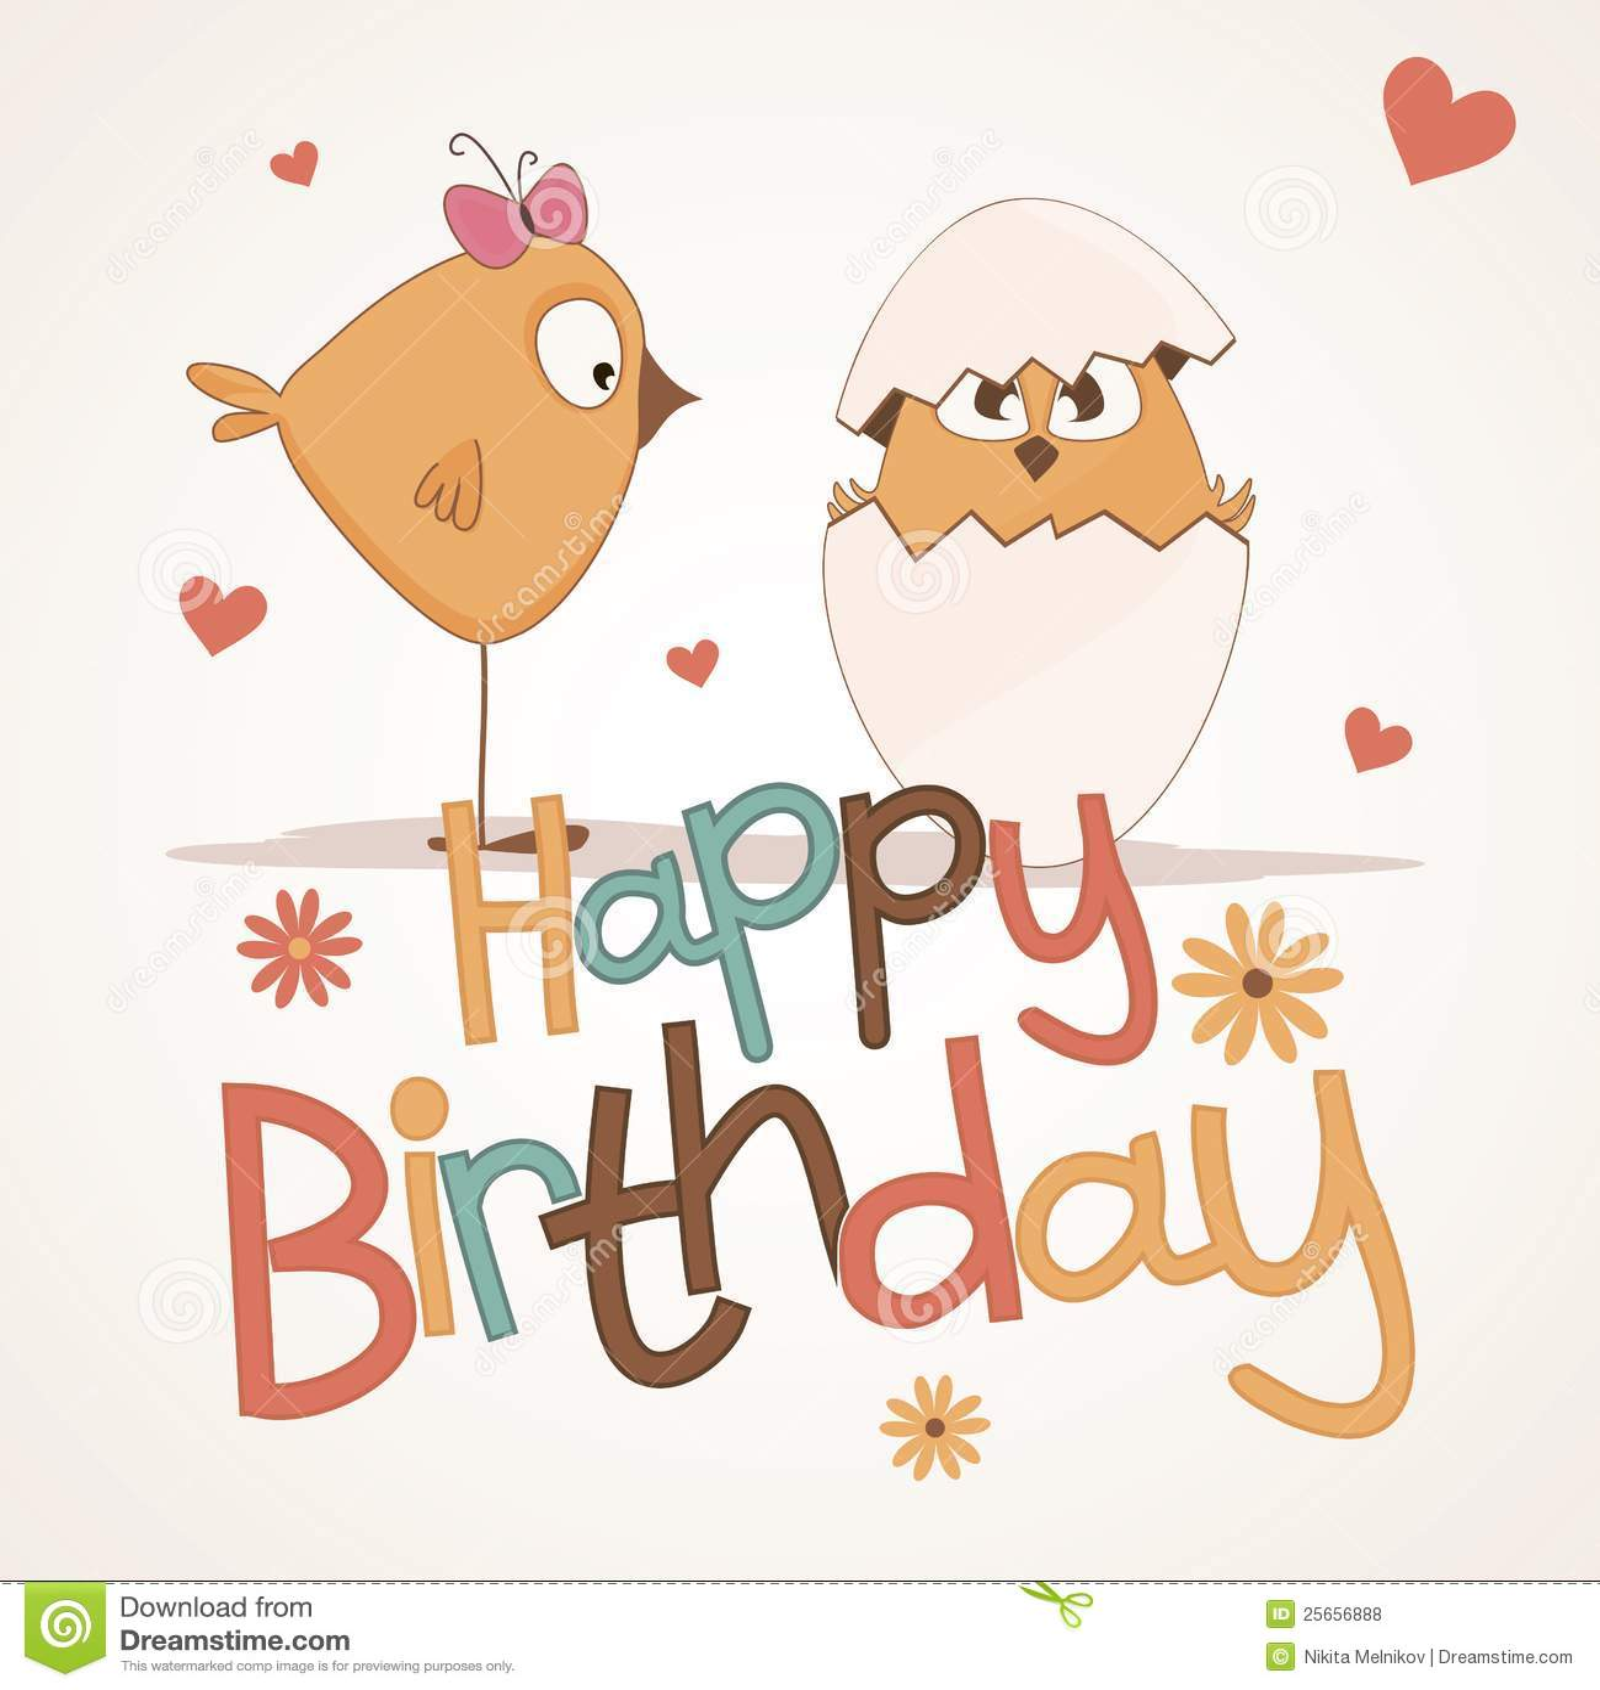 Cute Happy Birthday Card Royalty Free Photos Image 25656888 – Happy Birthday Cards Cute